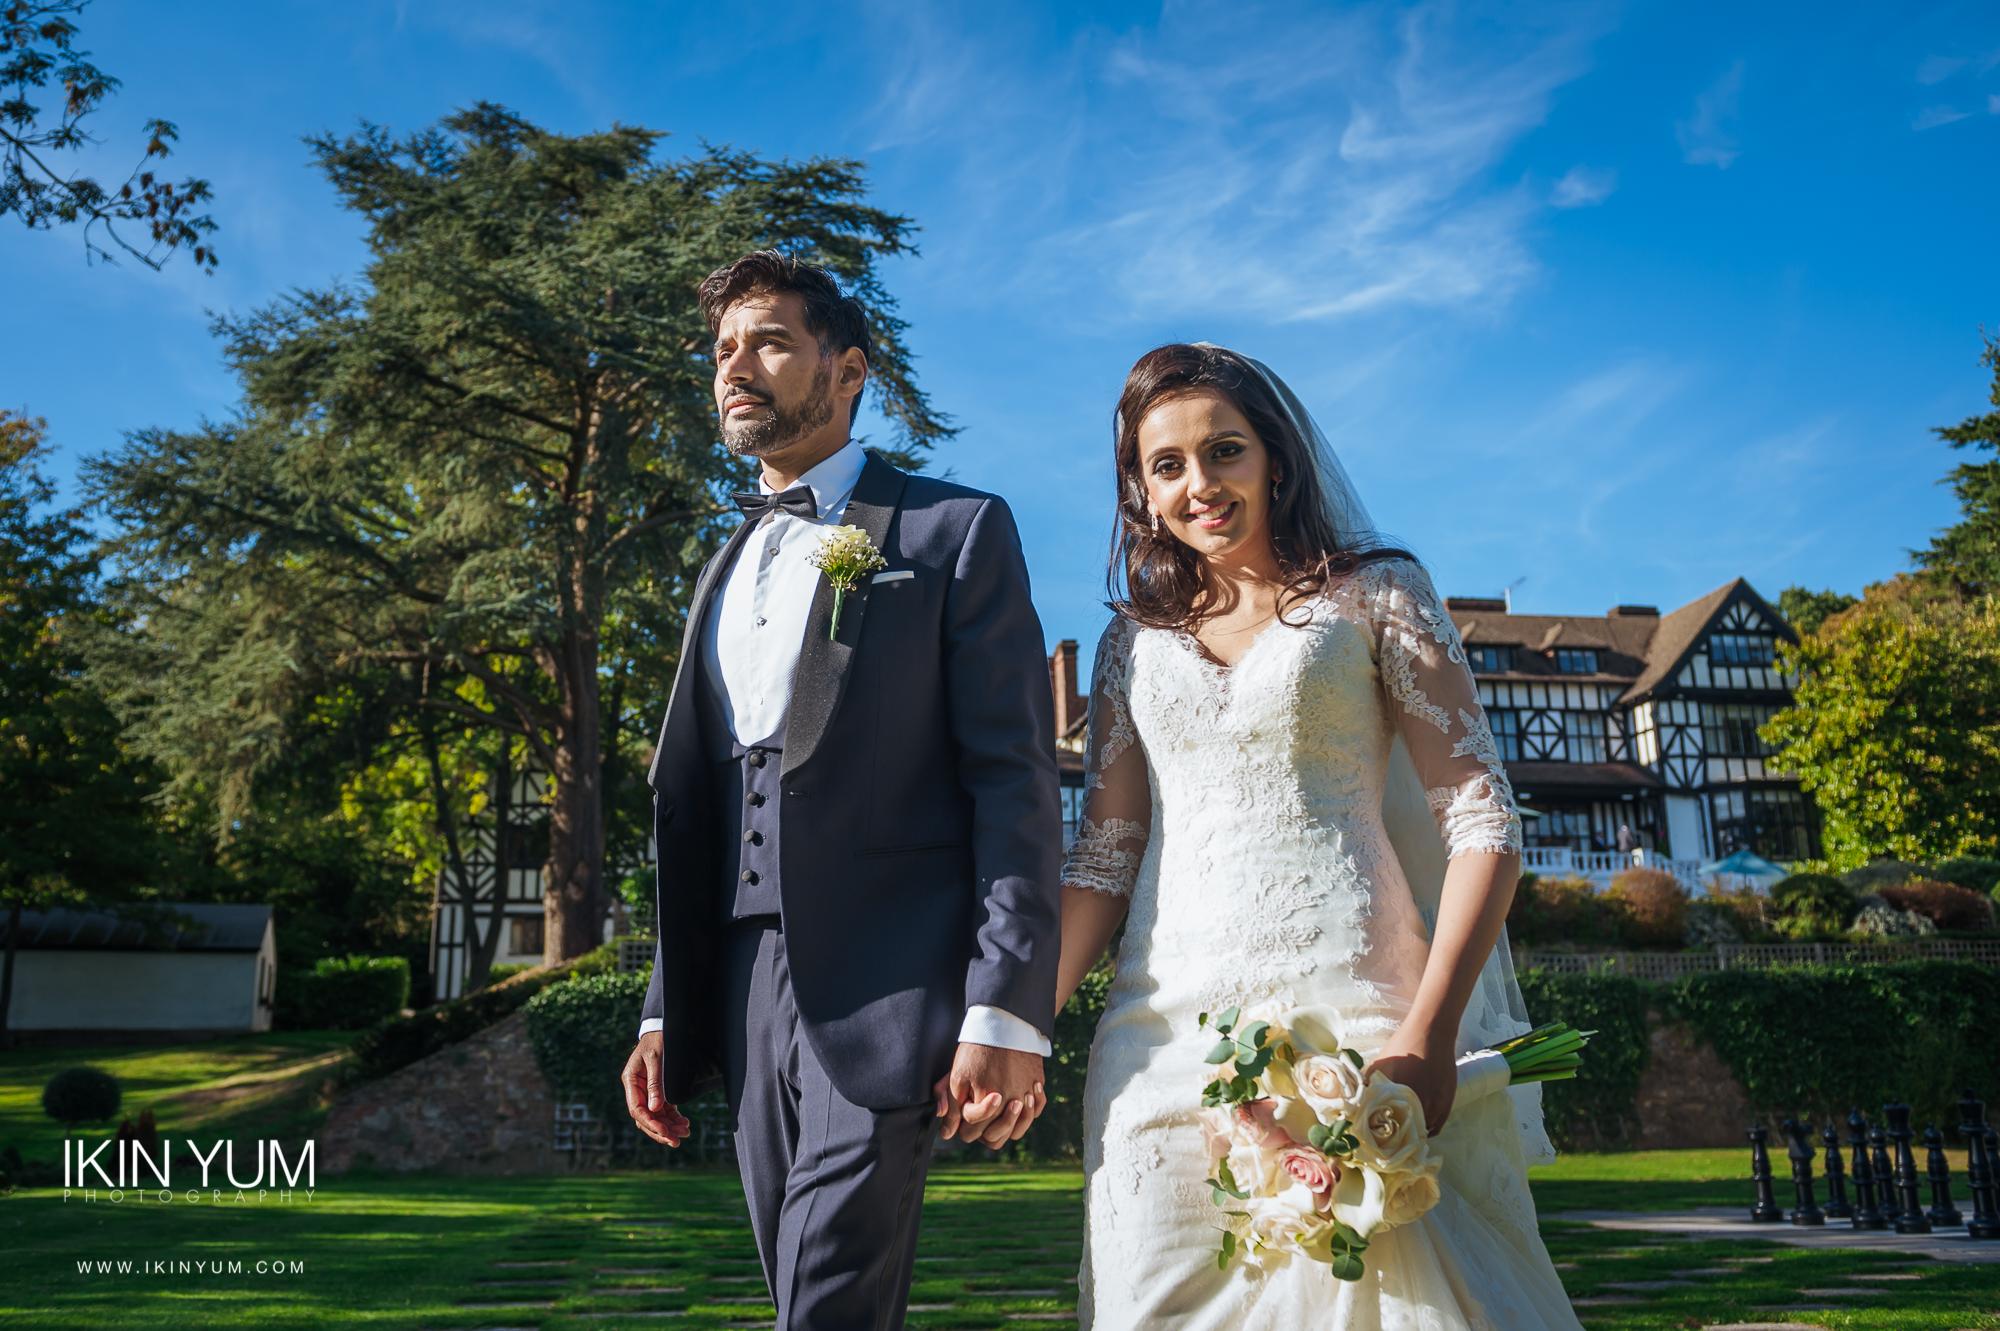 Laura Ashley Manor Wedding - Ikin Yum Photography-101.jpg